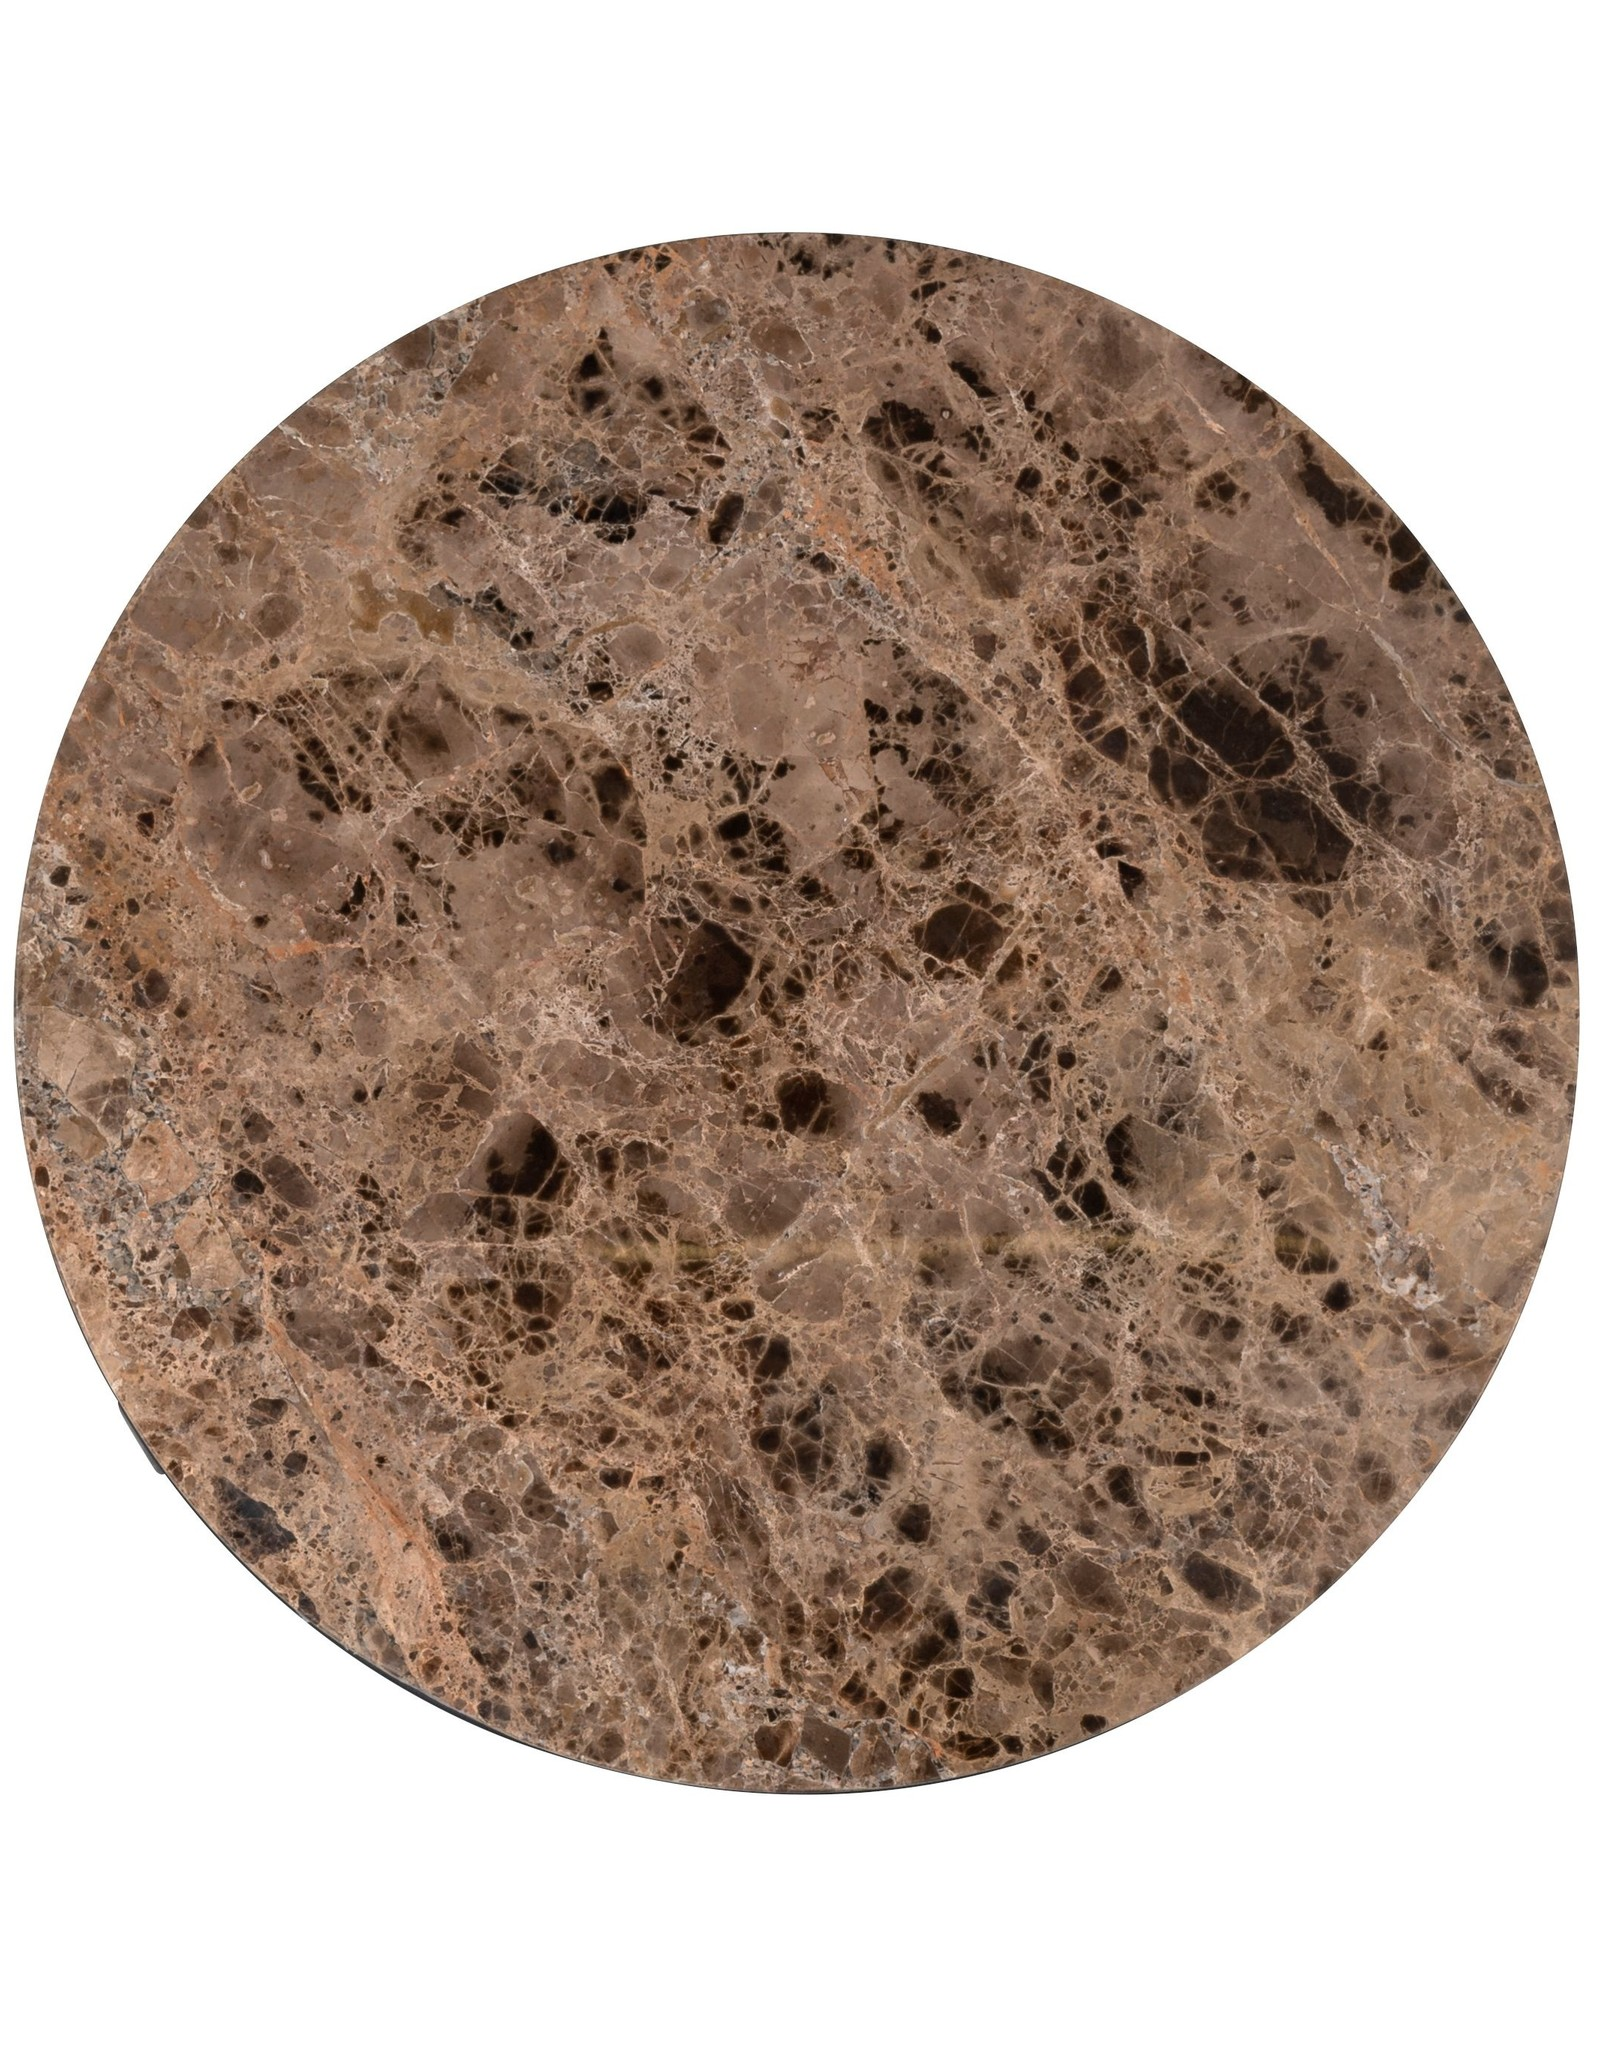 Richmond Interiors Salontafel Orion 60Ø met bruin marmer